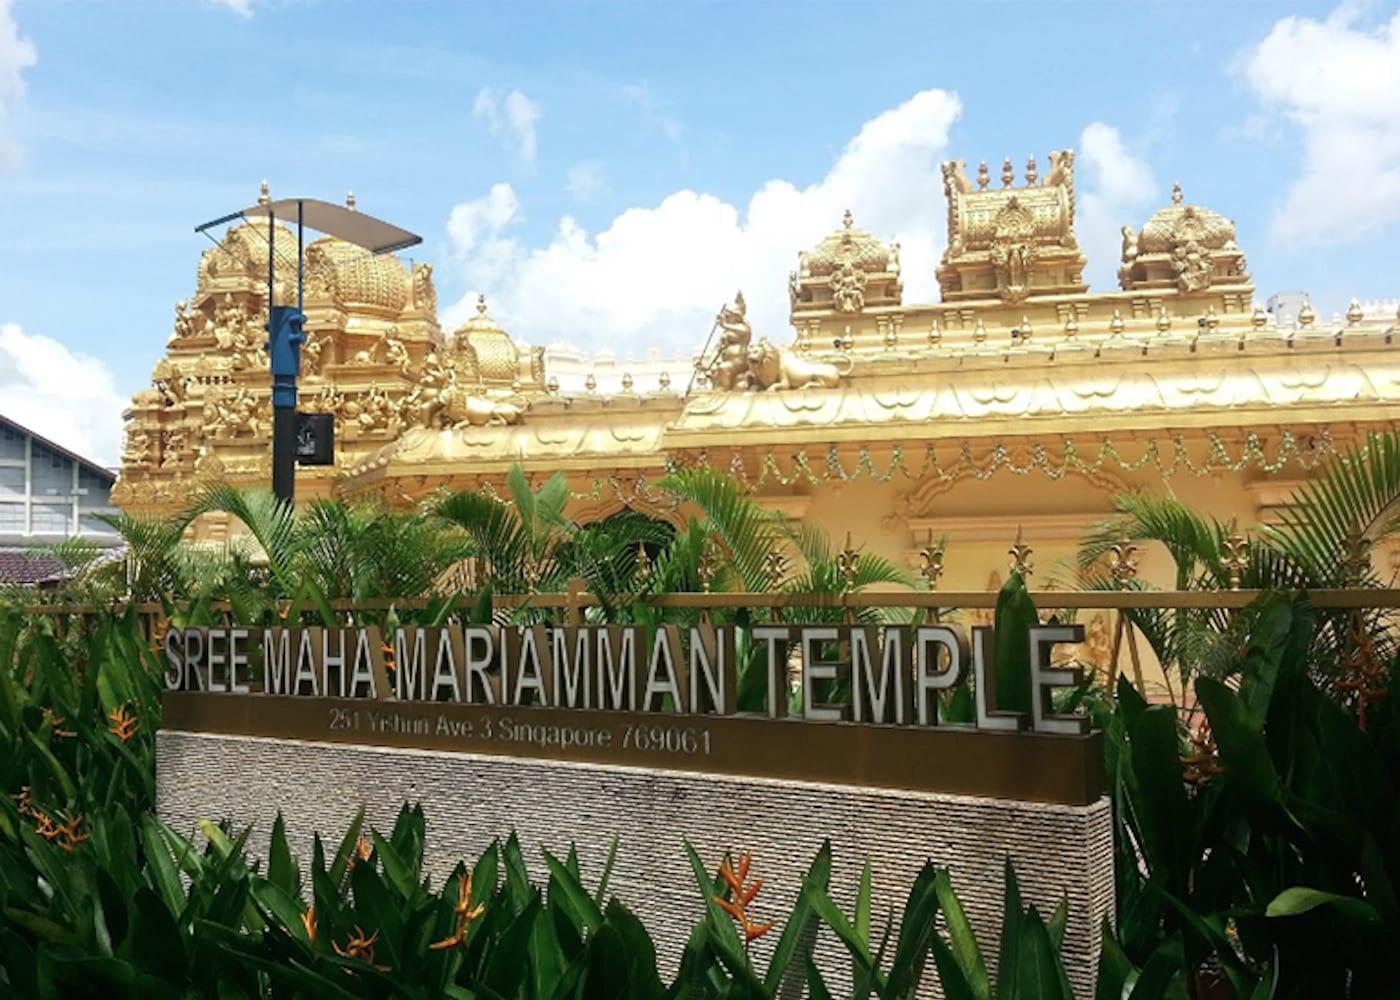 Singapore Temples: Sree Maha Mariamman Temple